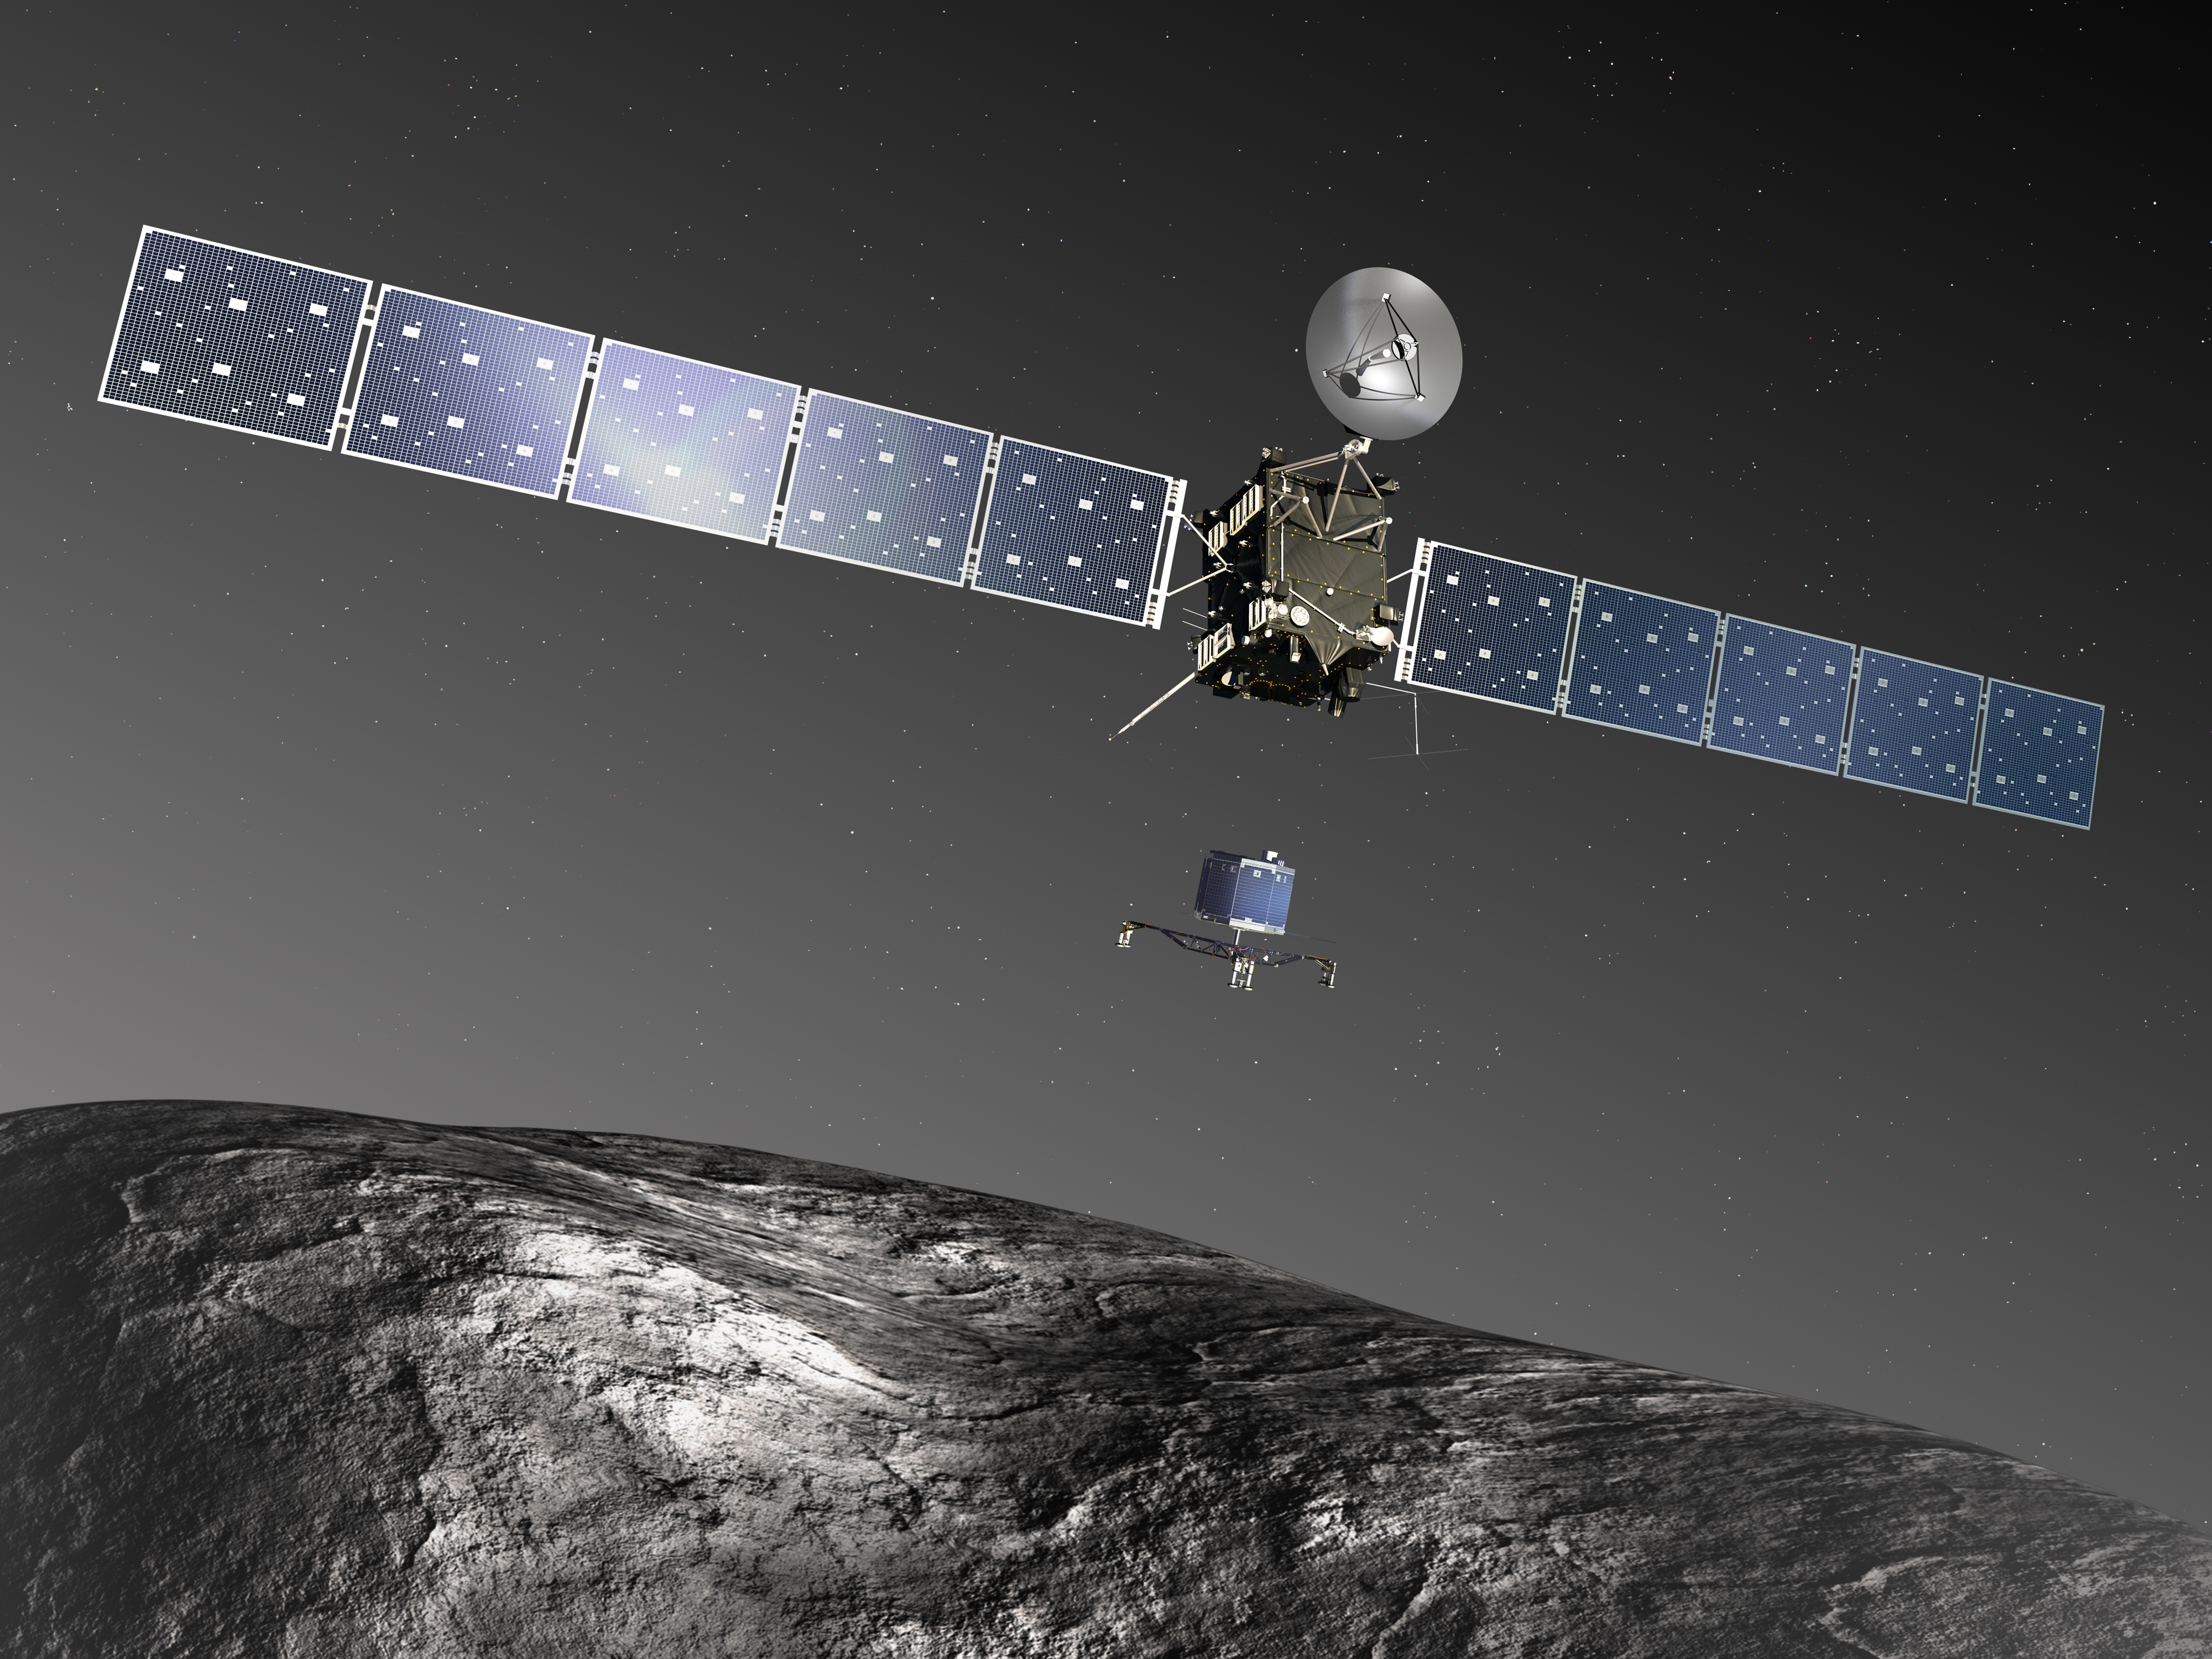 Rosette mission